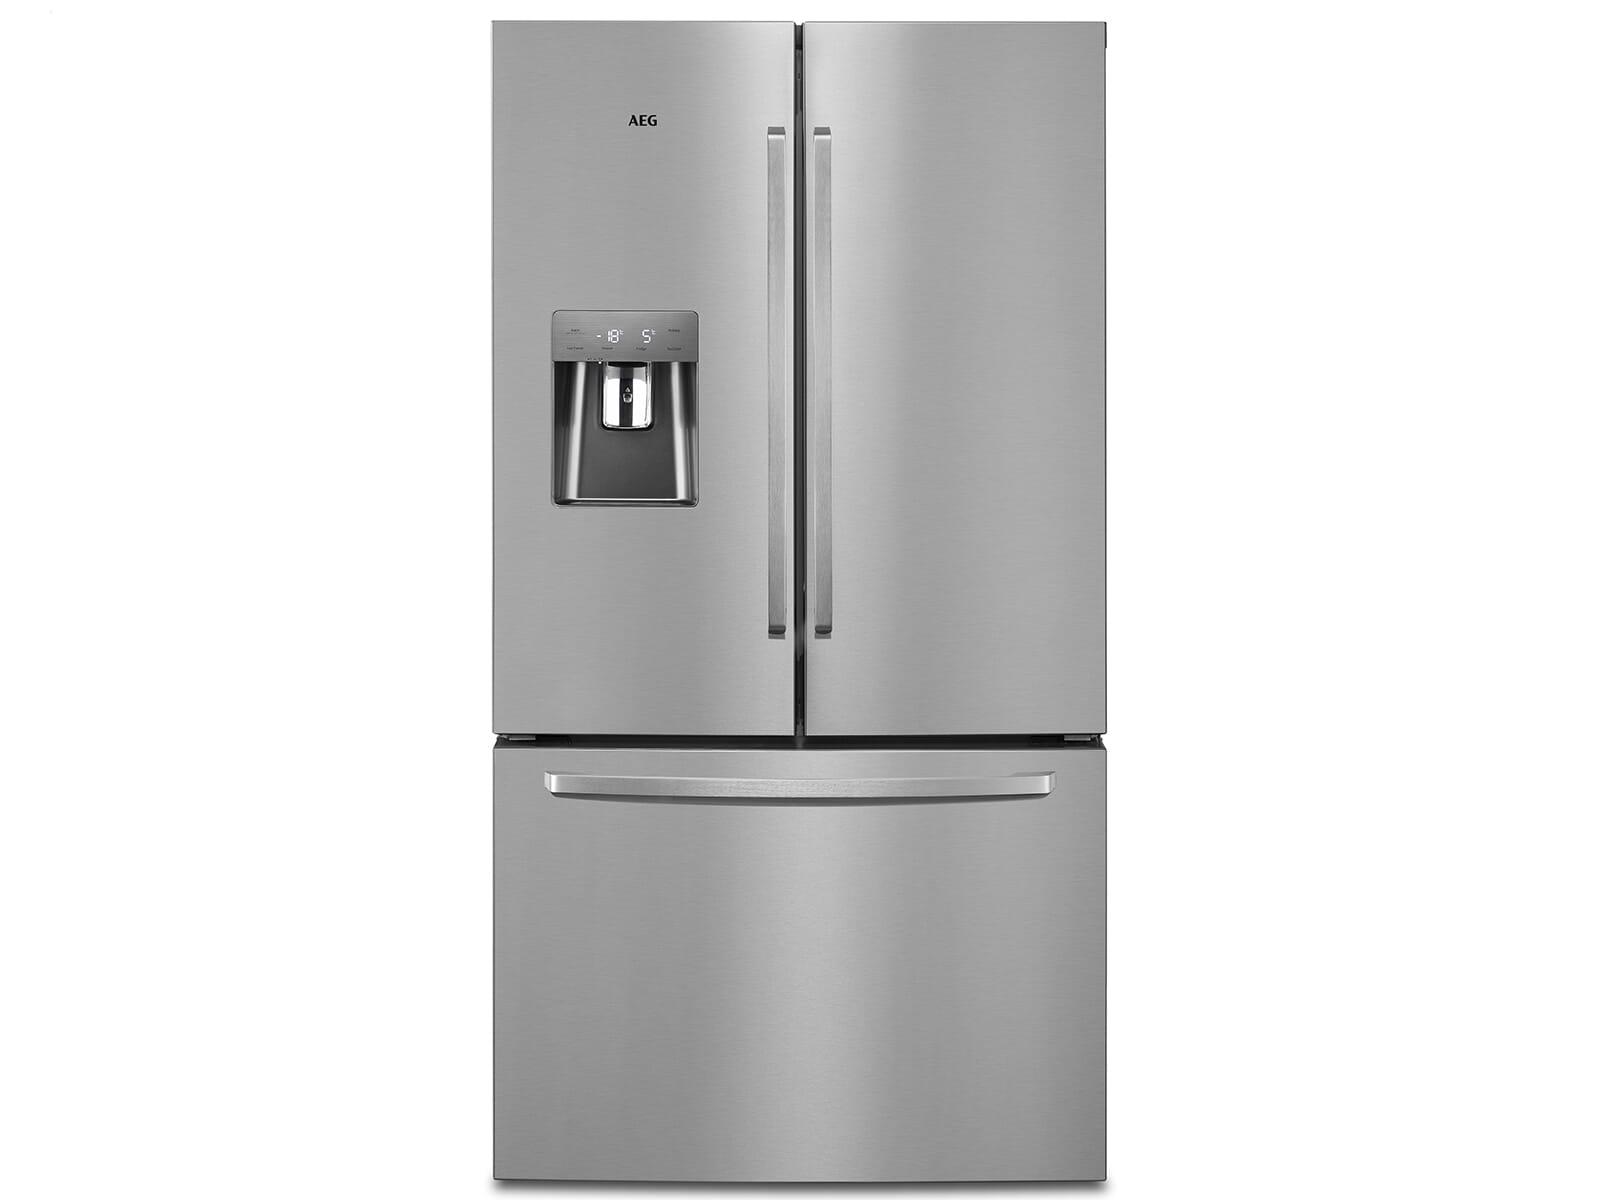 Aeg Kühlschrank Side By Side : Aeg rmb nx french door kühl gefrierkombination edelstahl